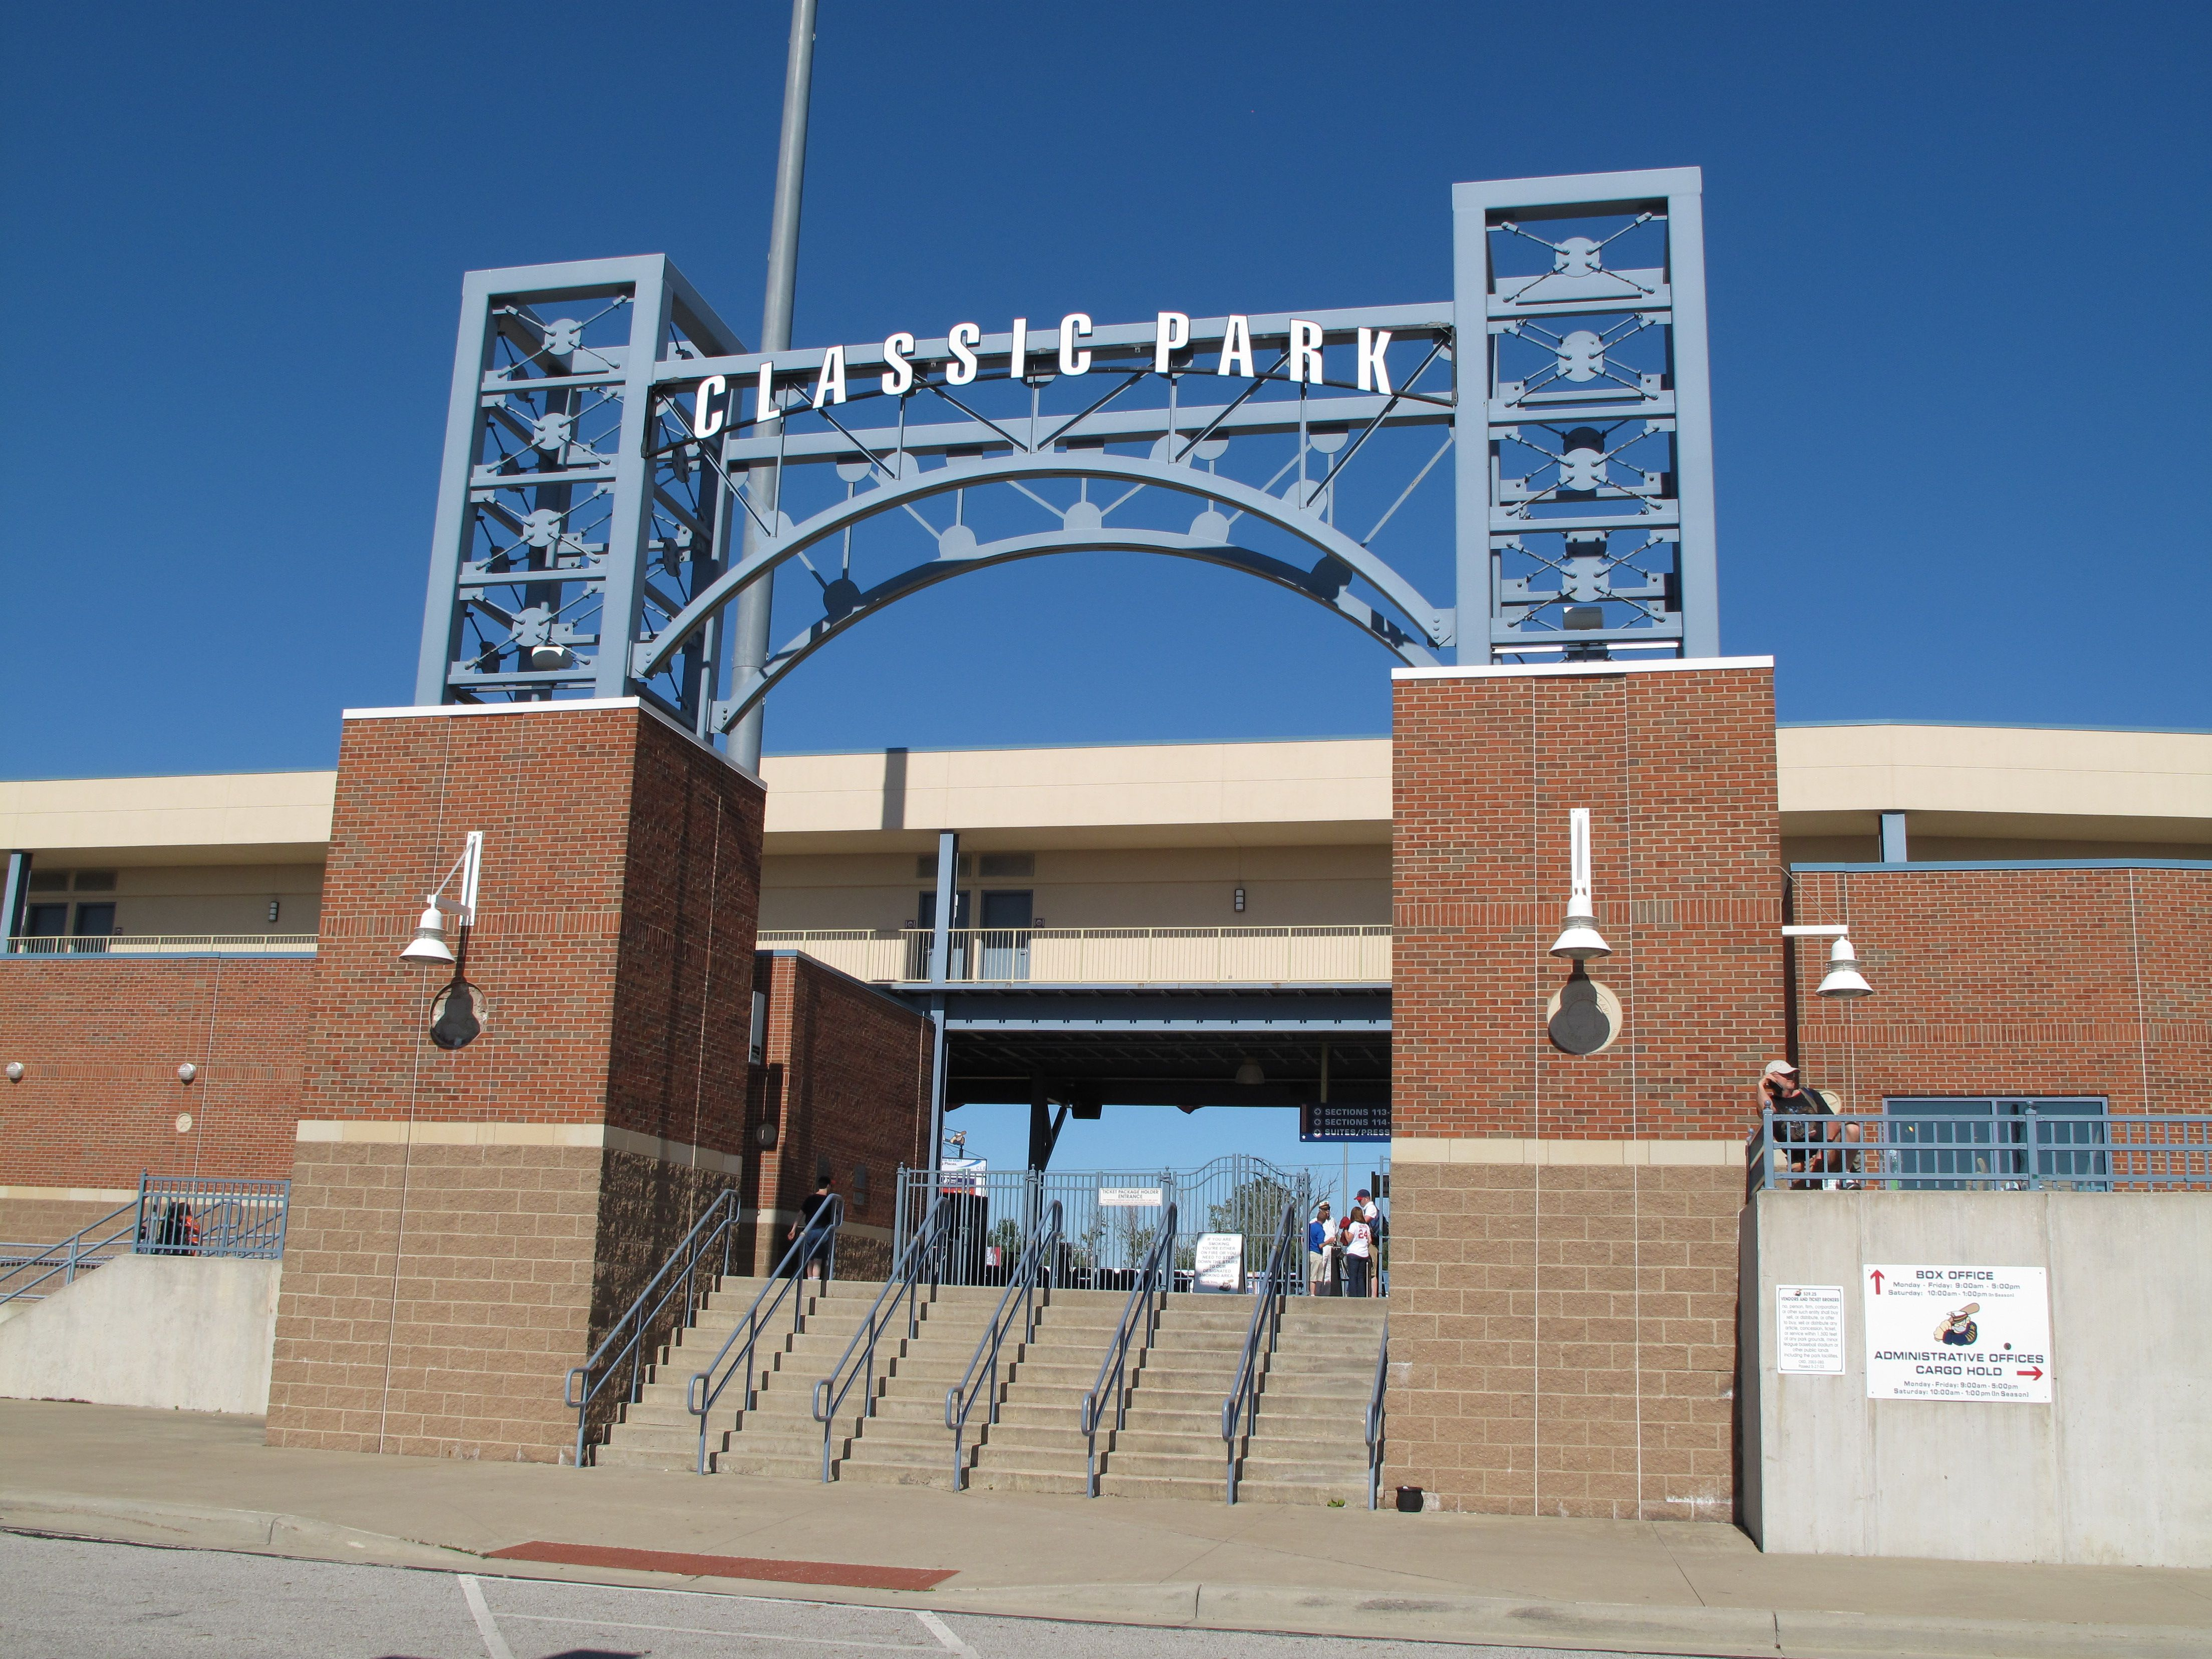 Pin by Lindsey Kunas on Arenas & stadiums Ohio, Eastlake